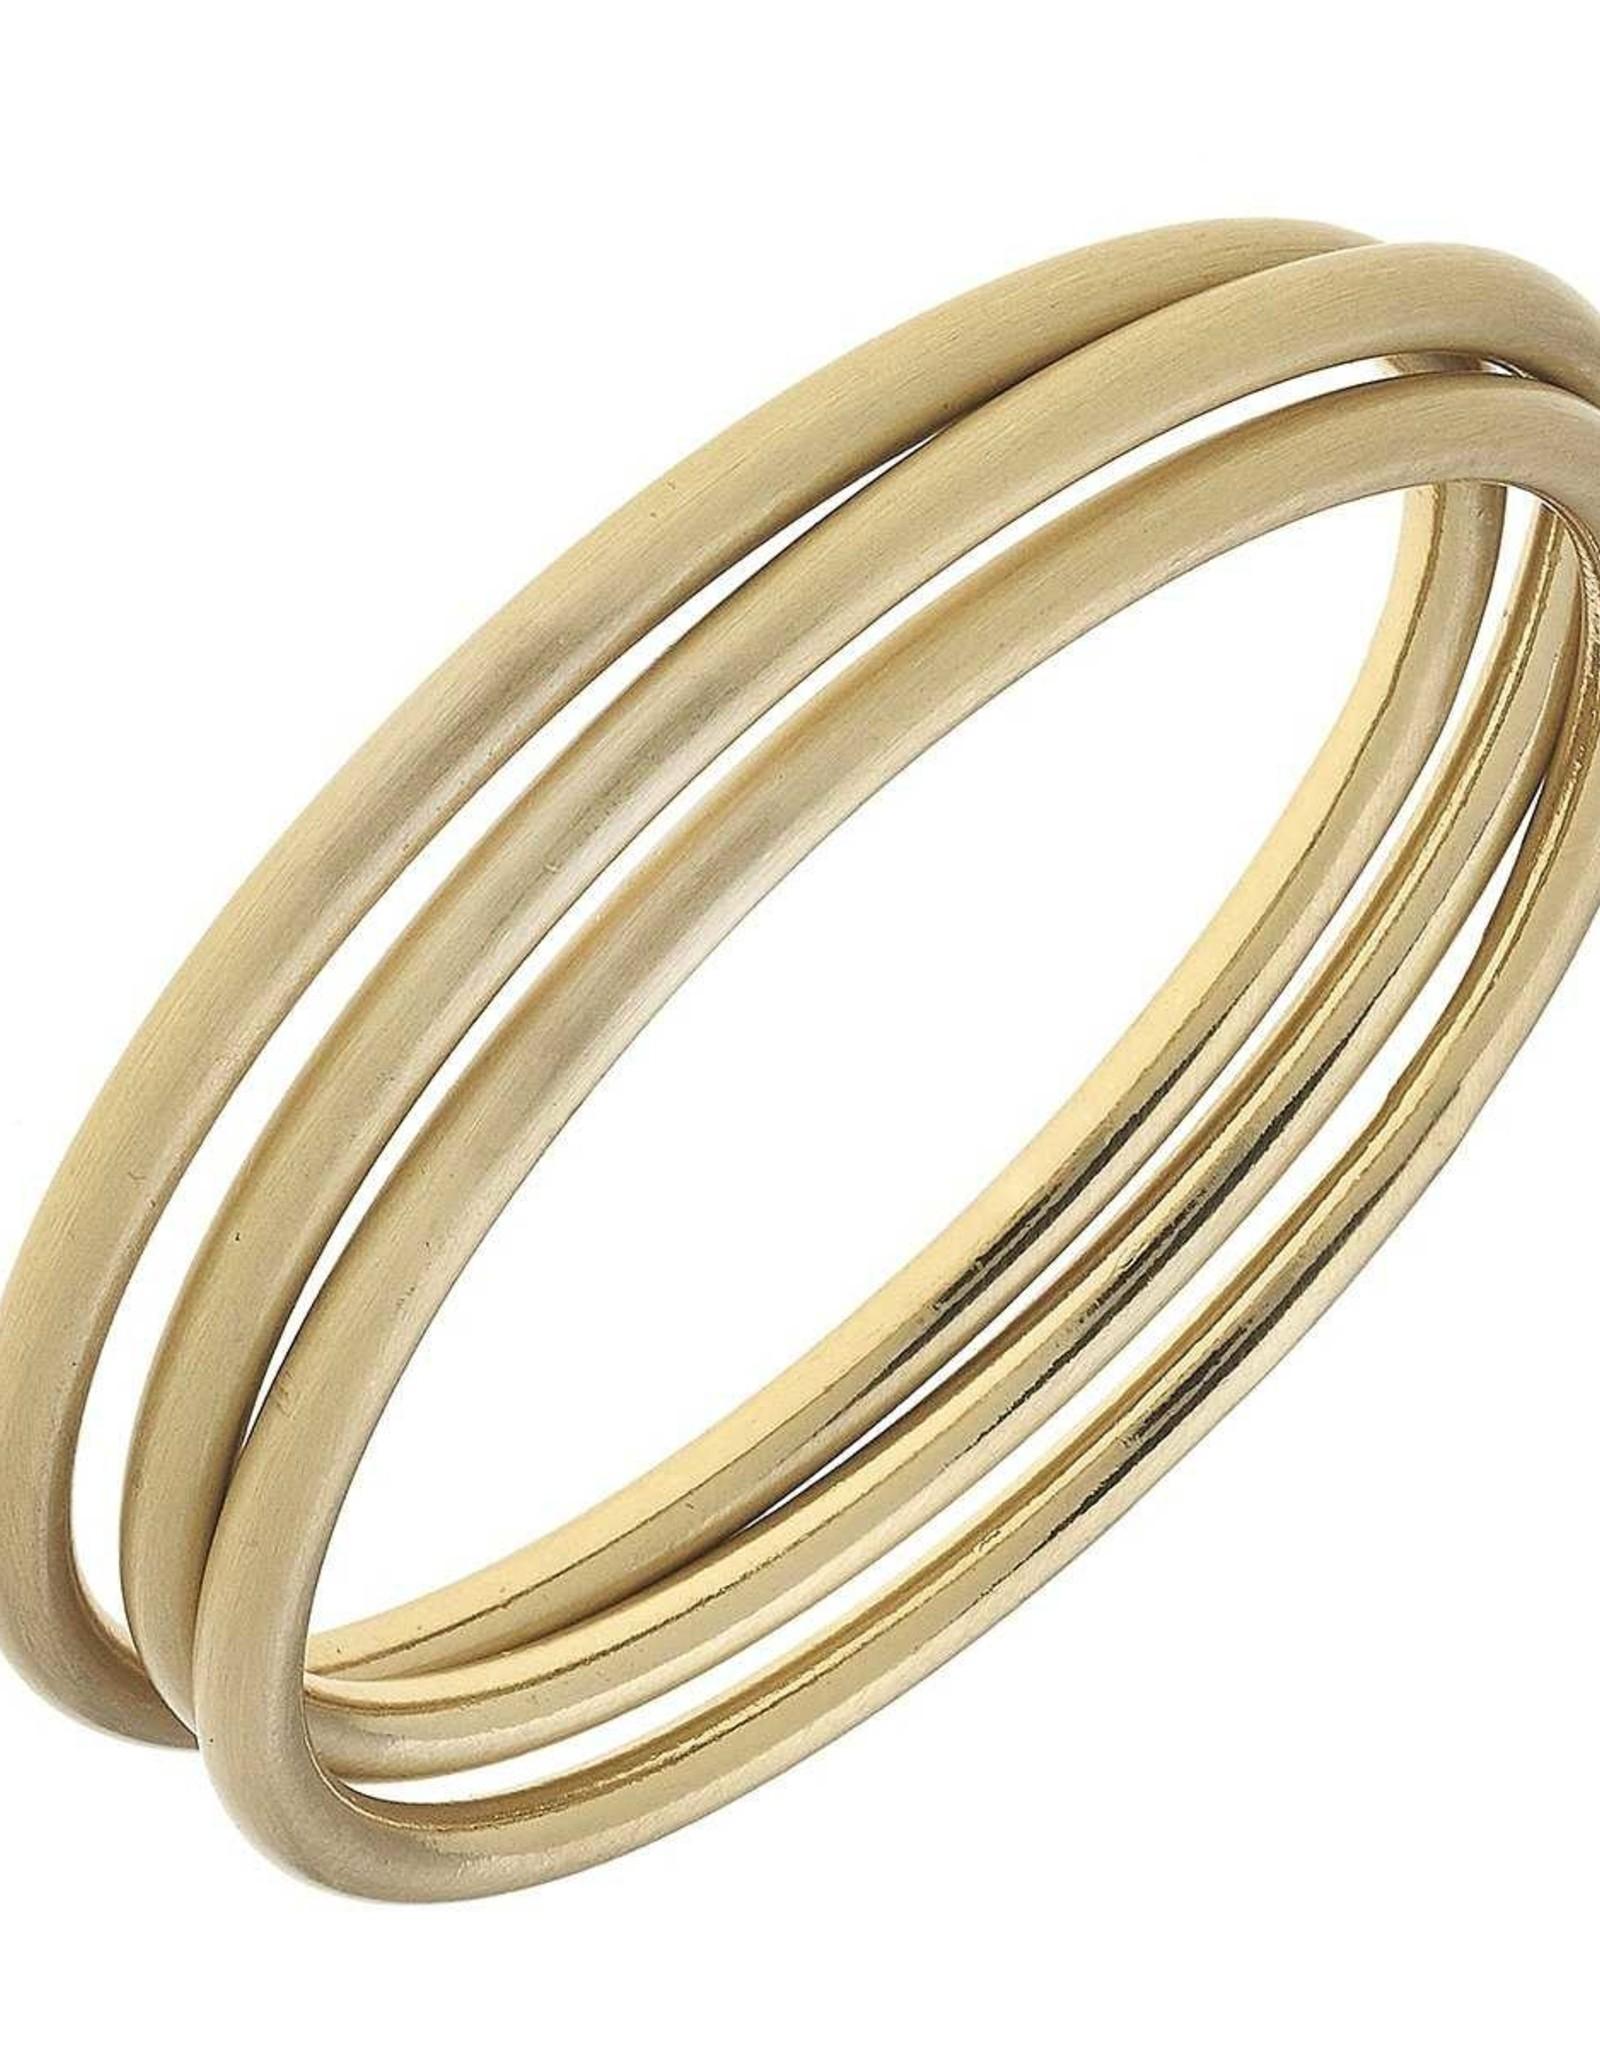 - Bangles in Satin Gold - Set of 3